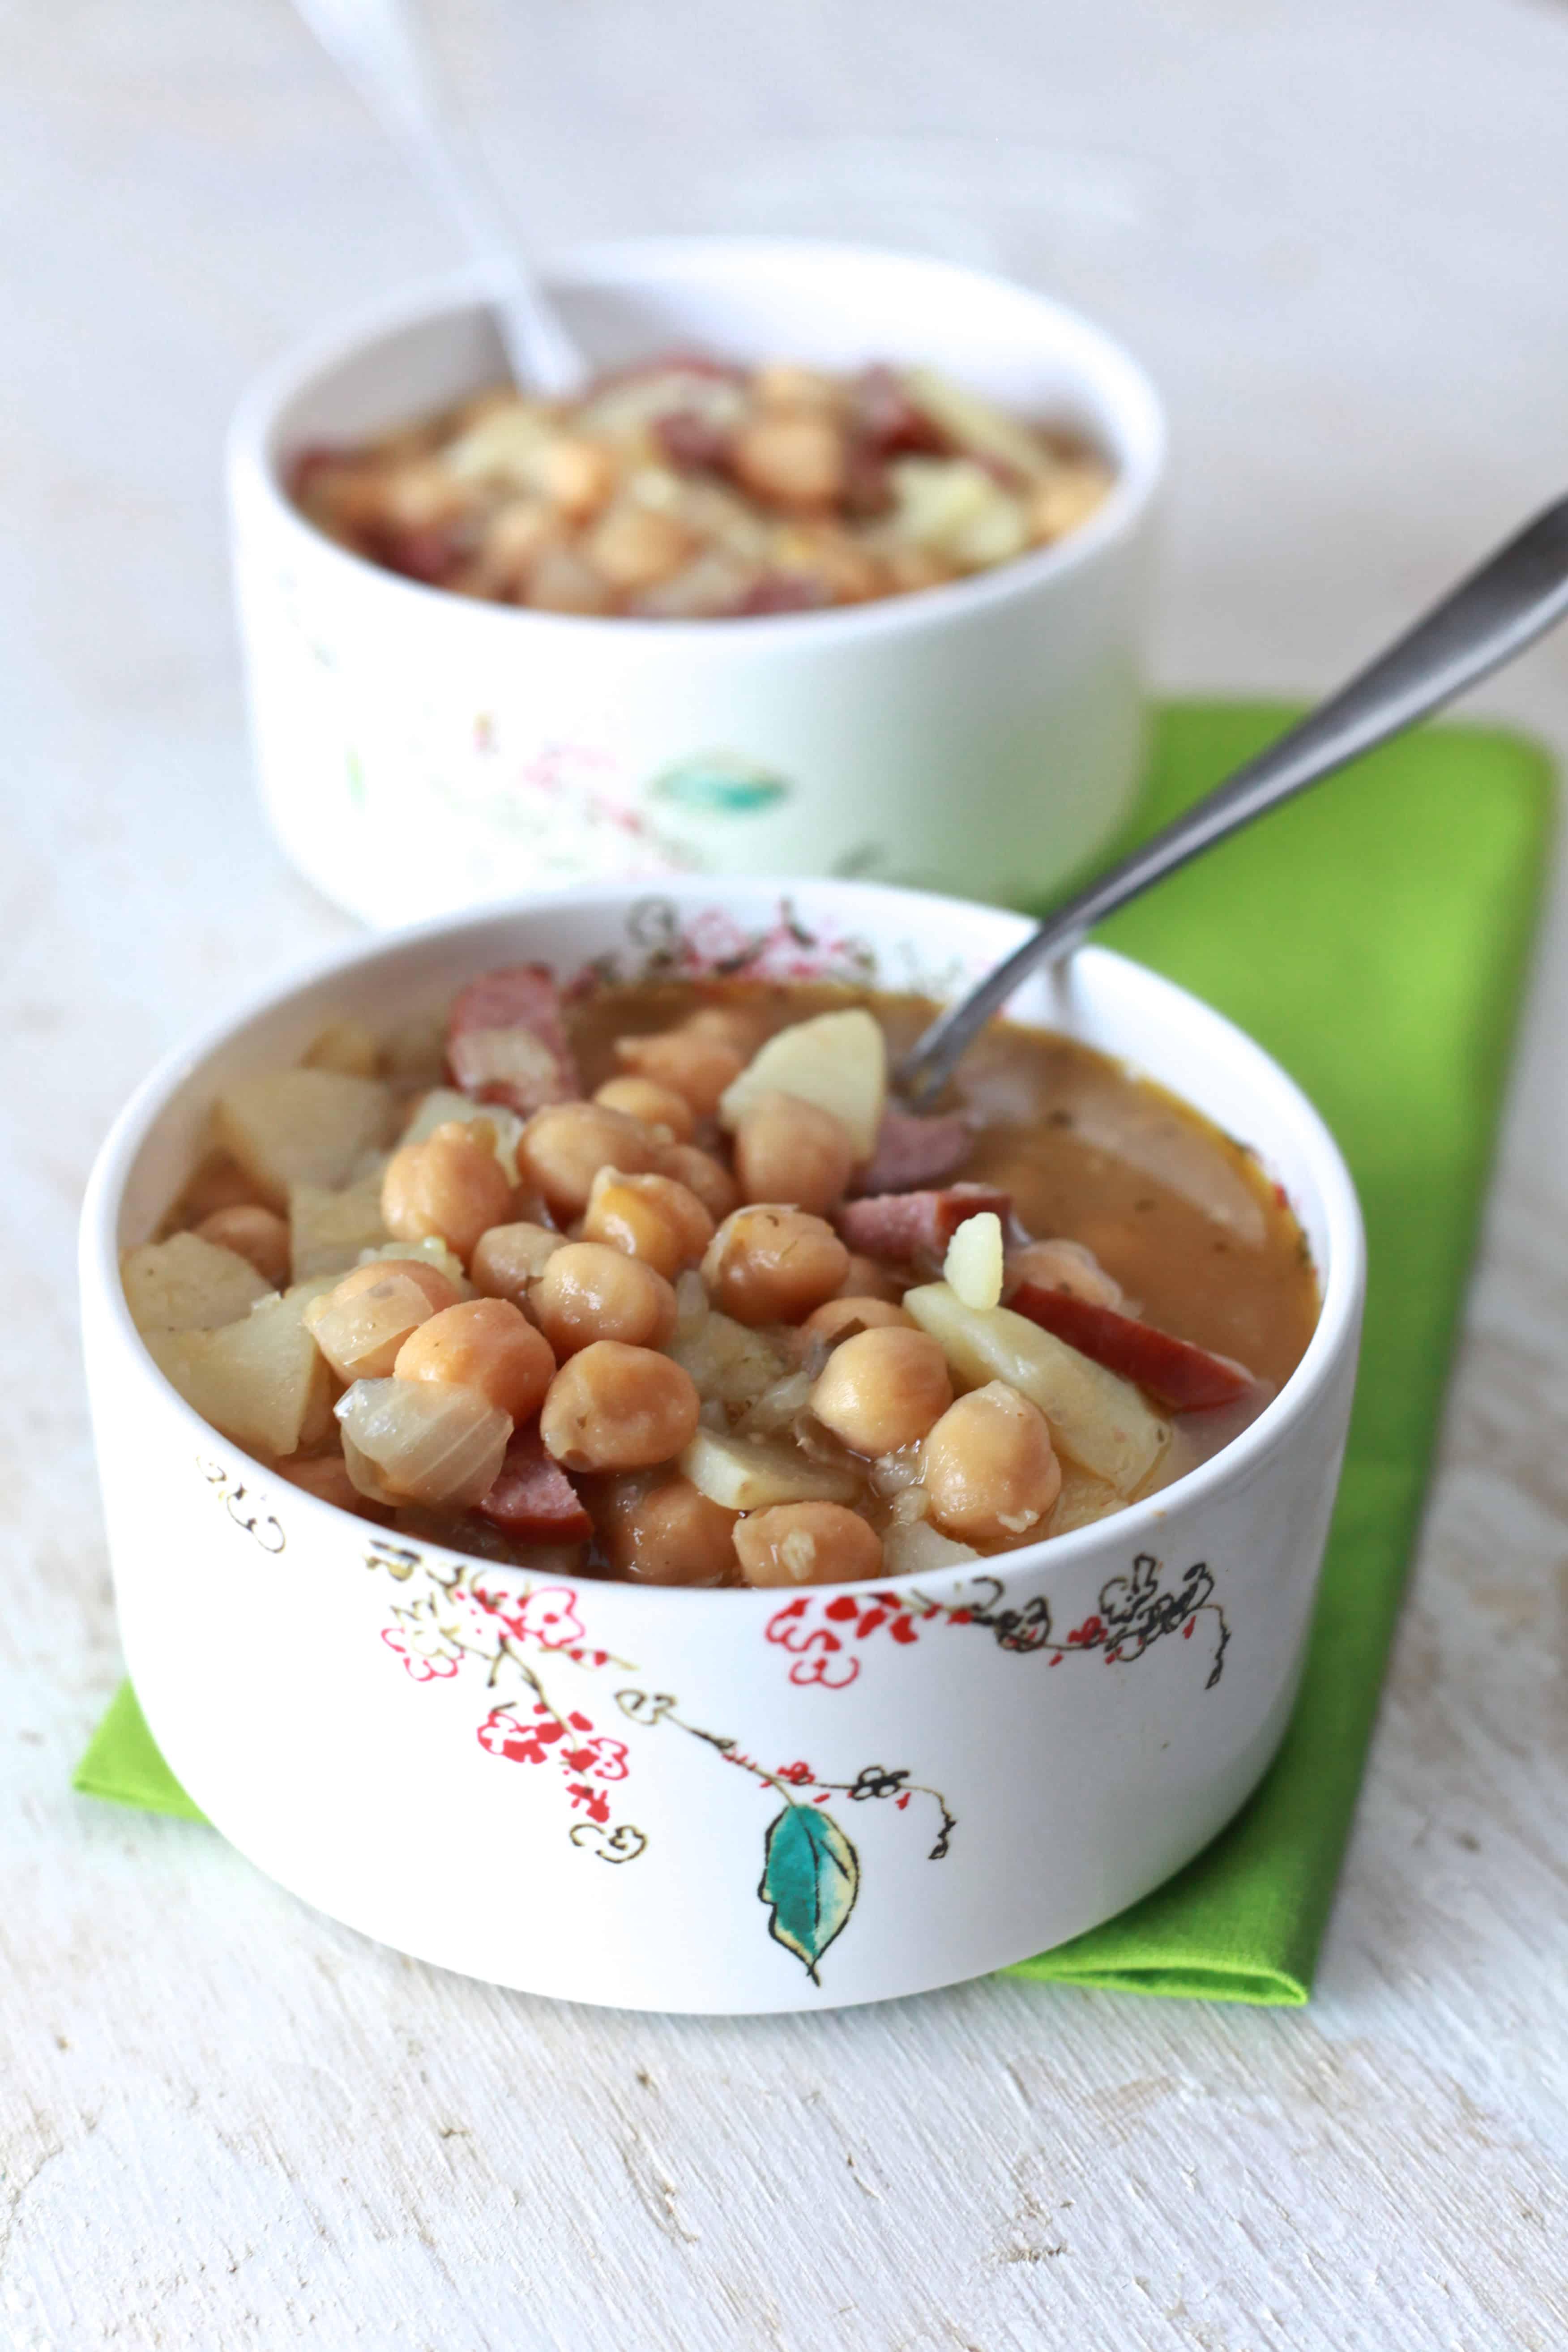 recipe: cuban soup recipes with garbanzo beans [30]